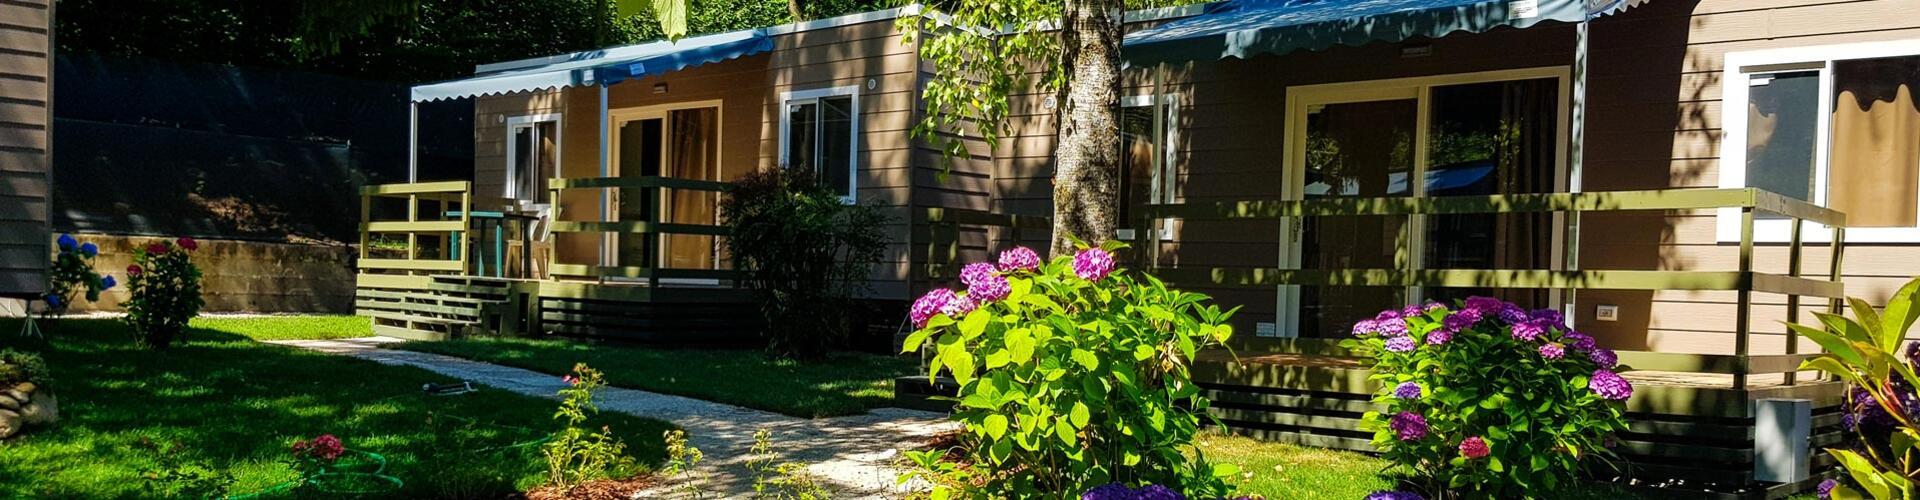 campingmontorfano en accommodations 003